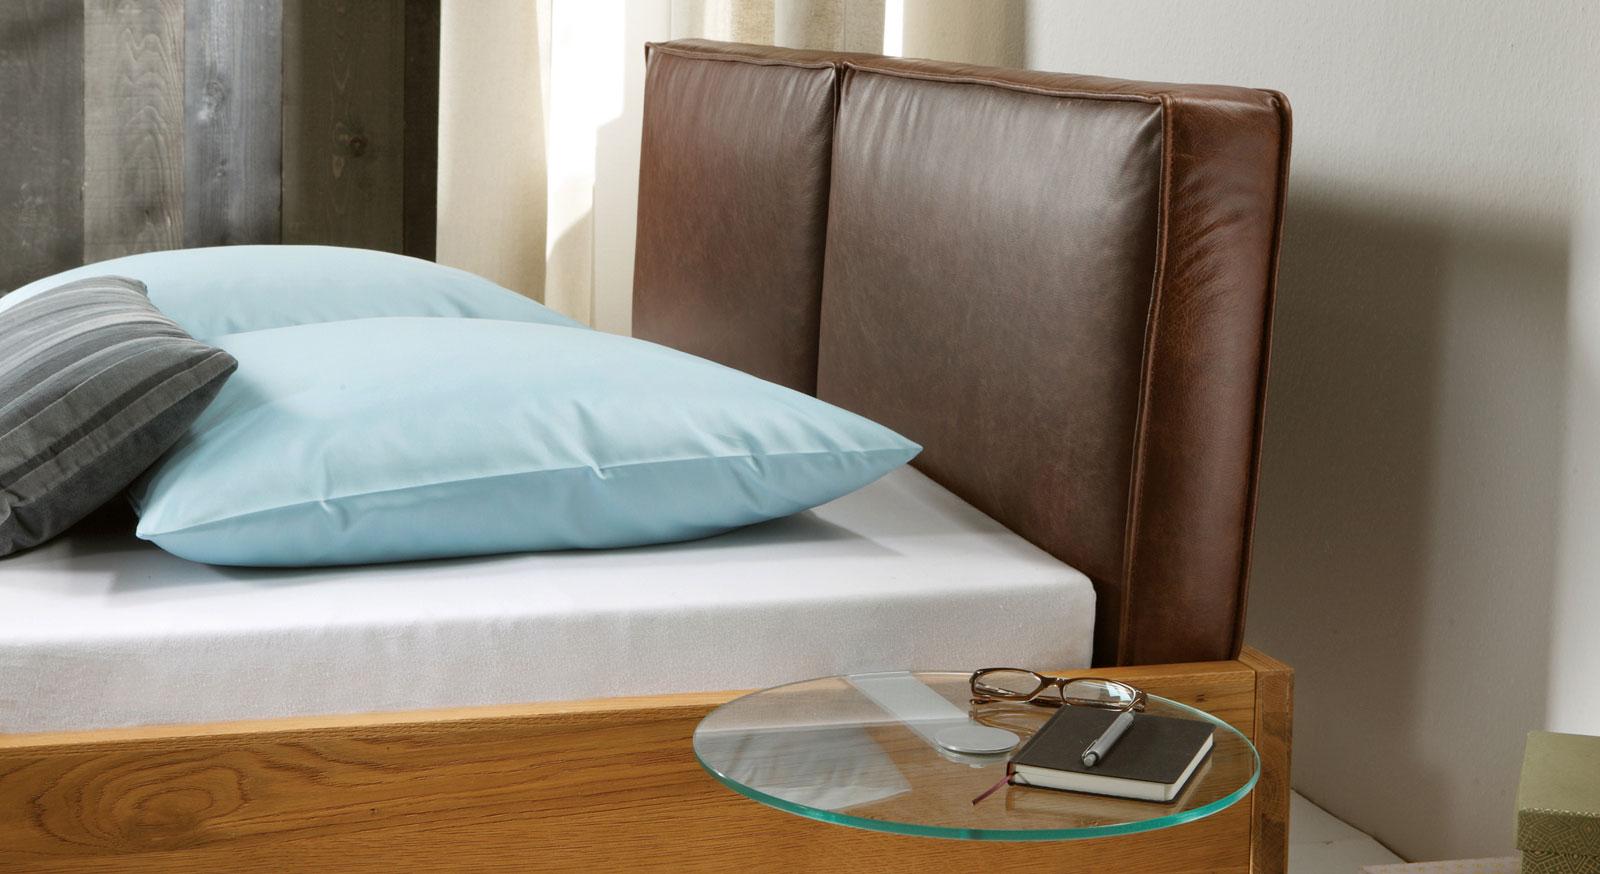 Full Size of Bett Rückwand Holz Rckwand Ikea Hack Diy Mbel Schlafzimmer 160x200 Modernes 180x200 Mit Bettkasten 200x200 Komforthöhe 2x2m Beleuchtung Schubladen Weiß Wohnzimmer Bett Rückwand Holz